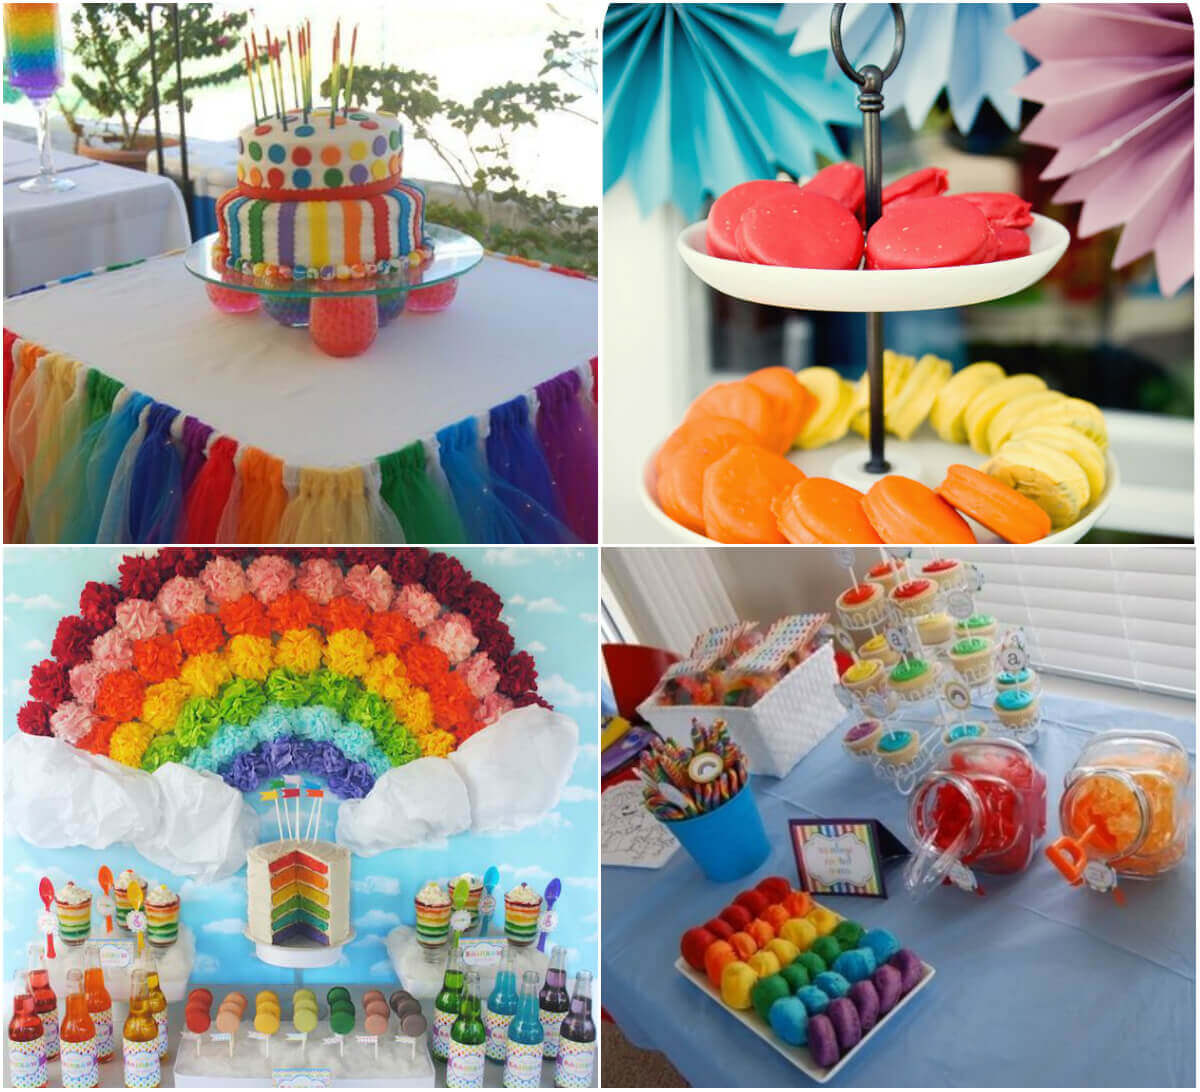 Regenbogen-Party mit Regenbogen-Dekoration